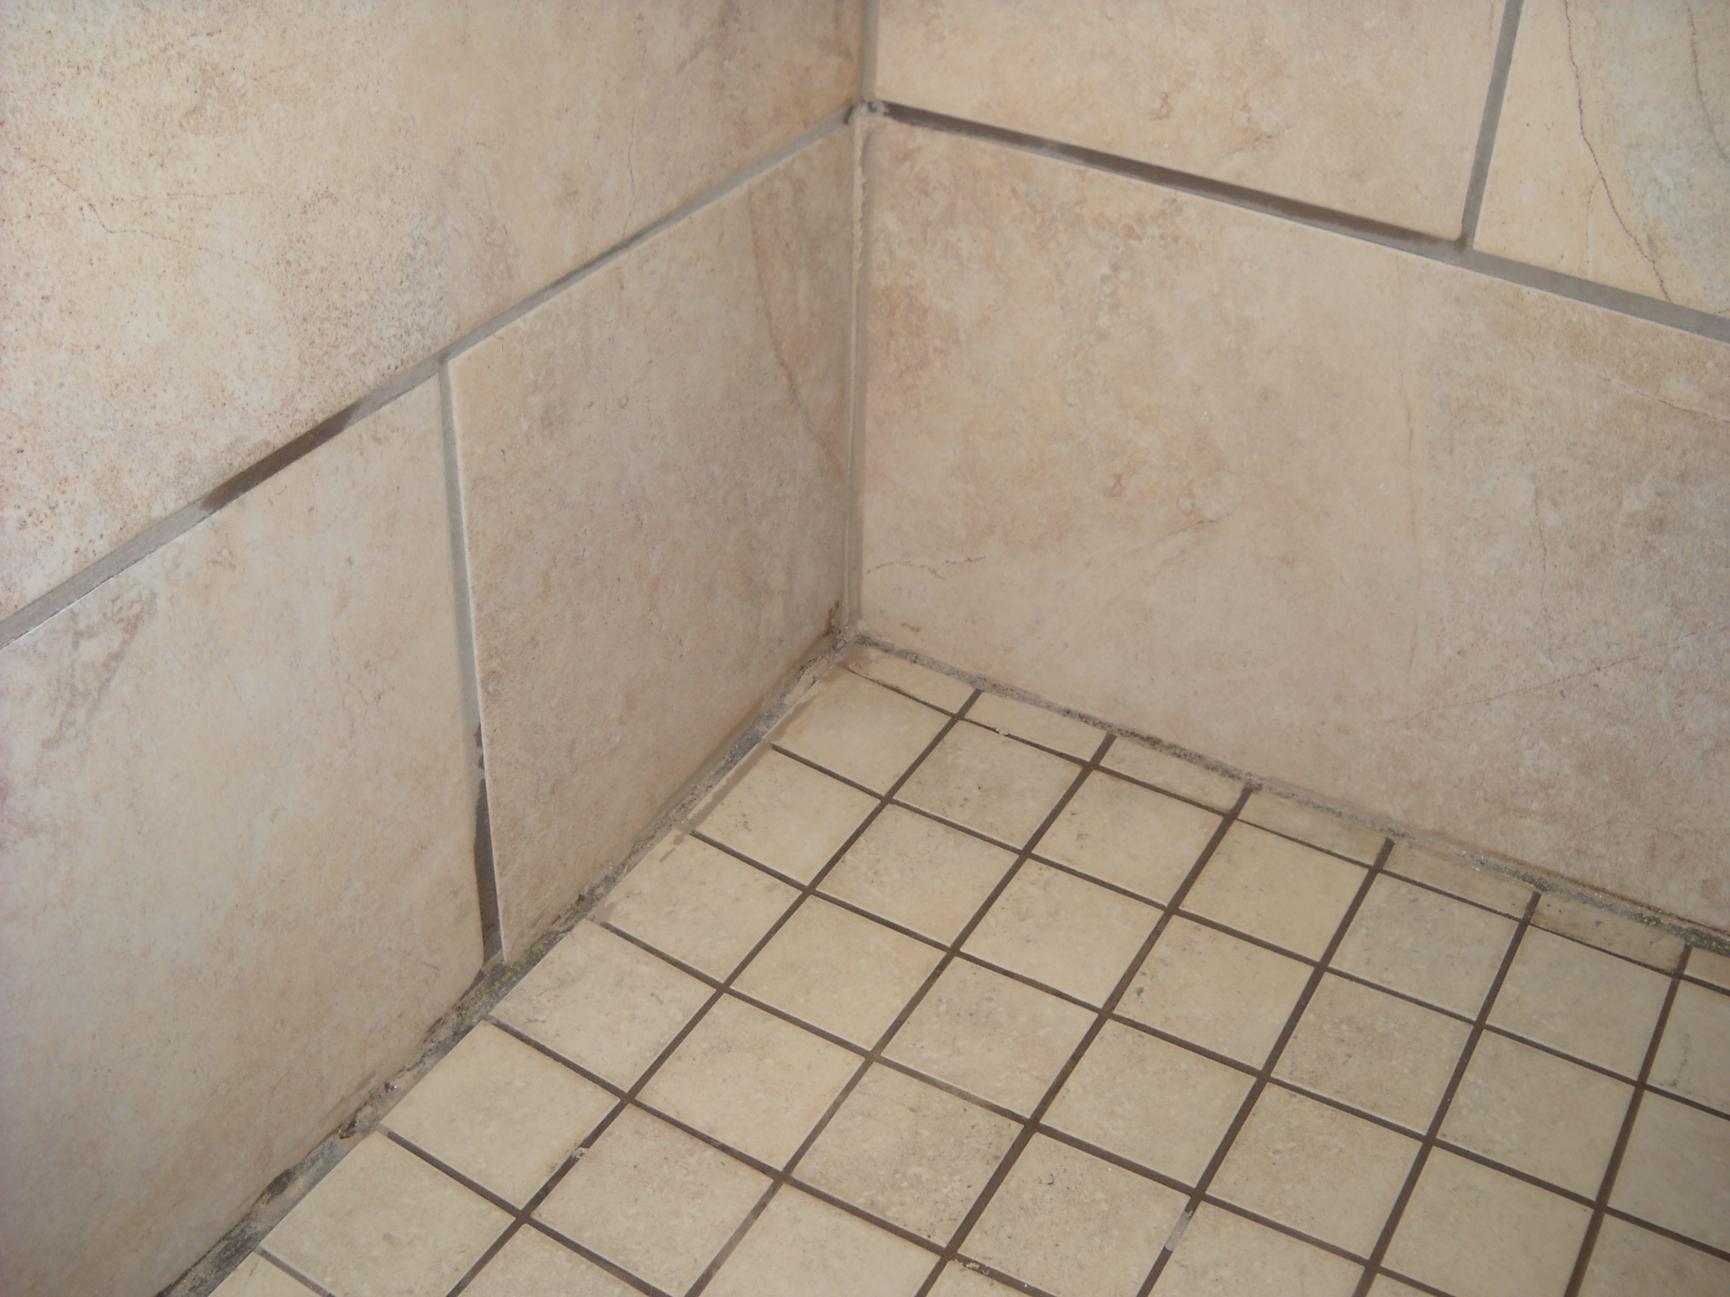 Tiled Shower Caulk Kitchens Baths